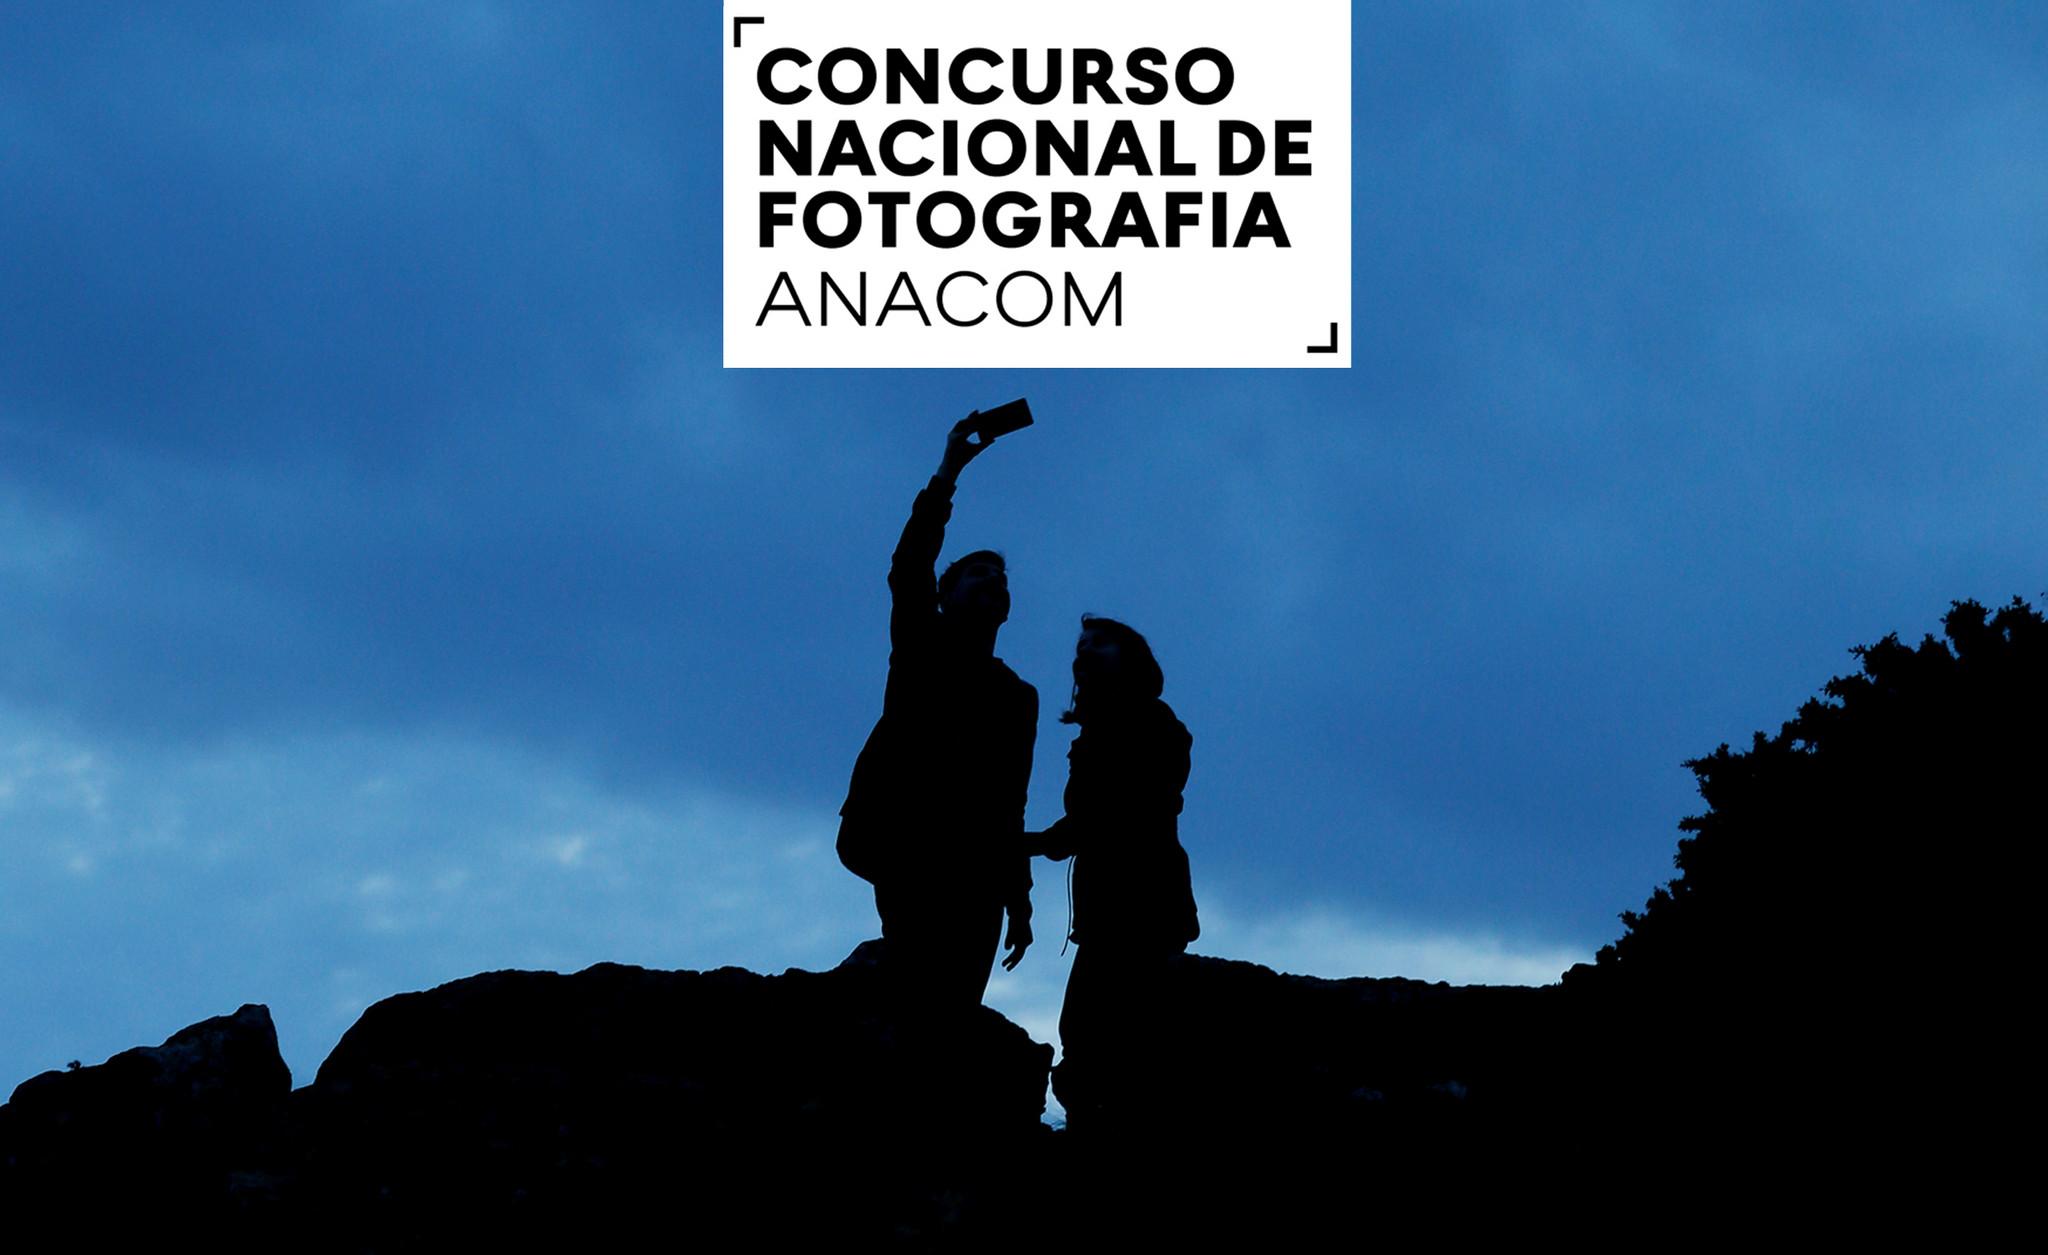 ConcursoFoto2.jpg